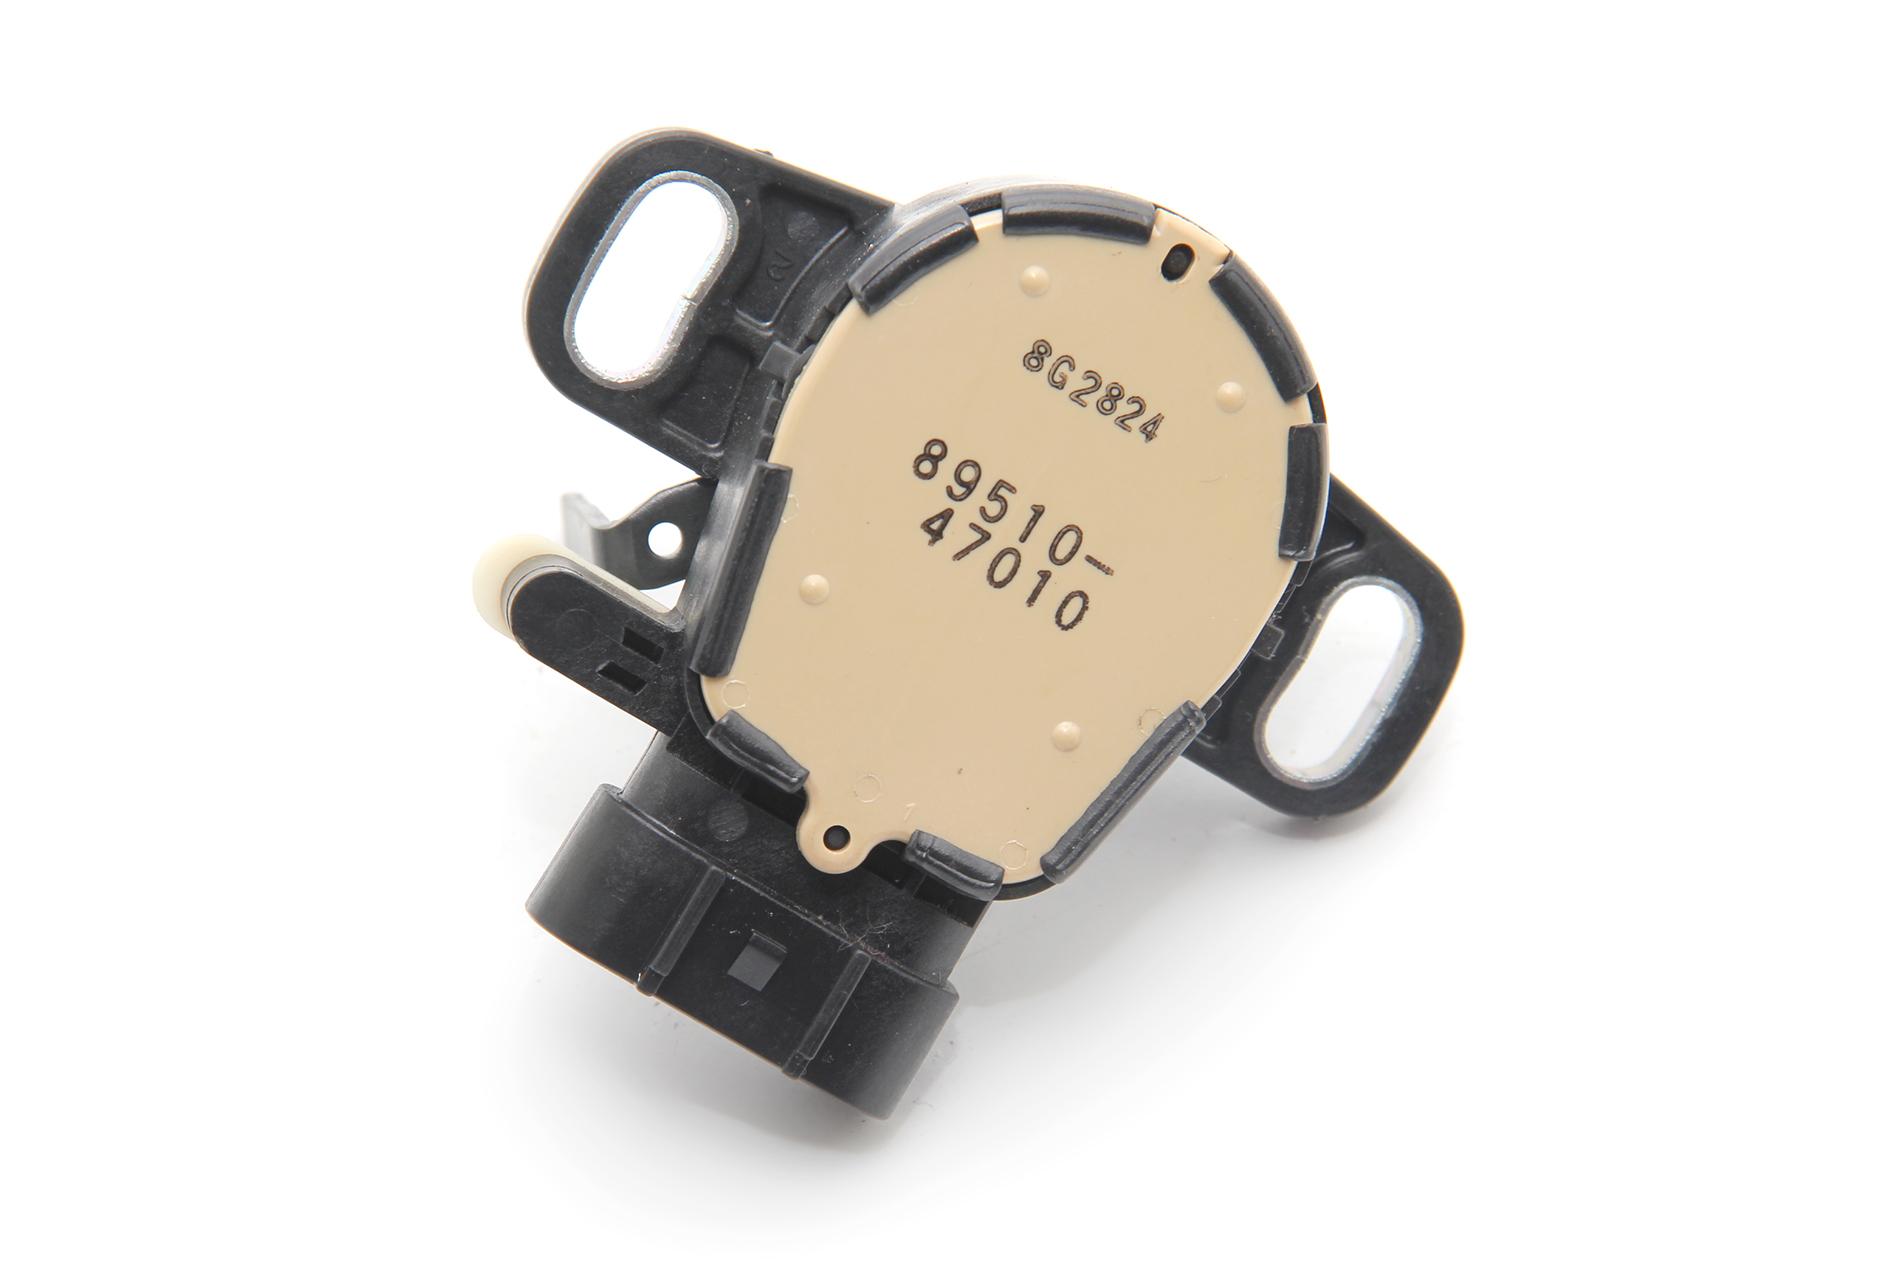 89510-47010-toyota-prius-brake-pedal-position-sensor-89510-47010-oem-04-05-06-07-08-09-2004.jpg